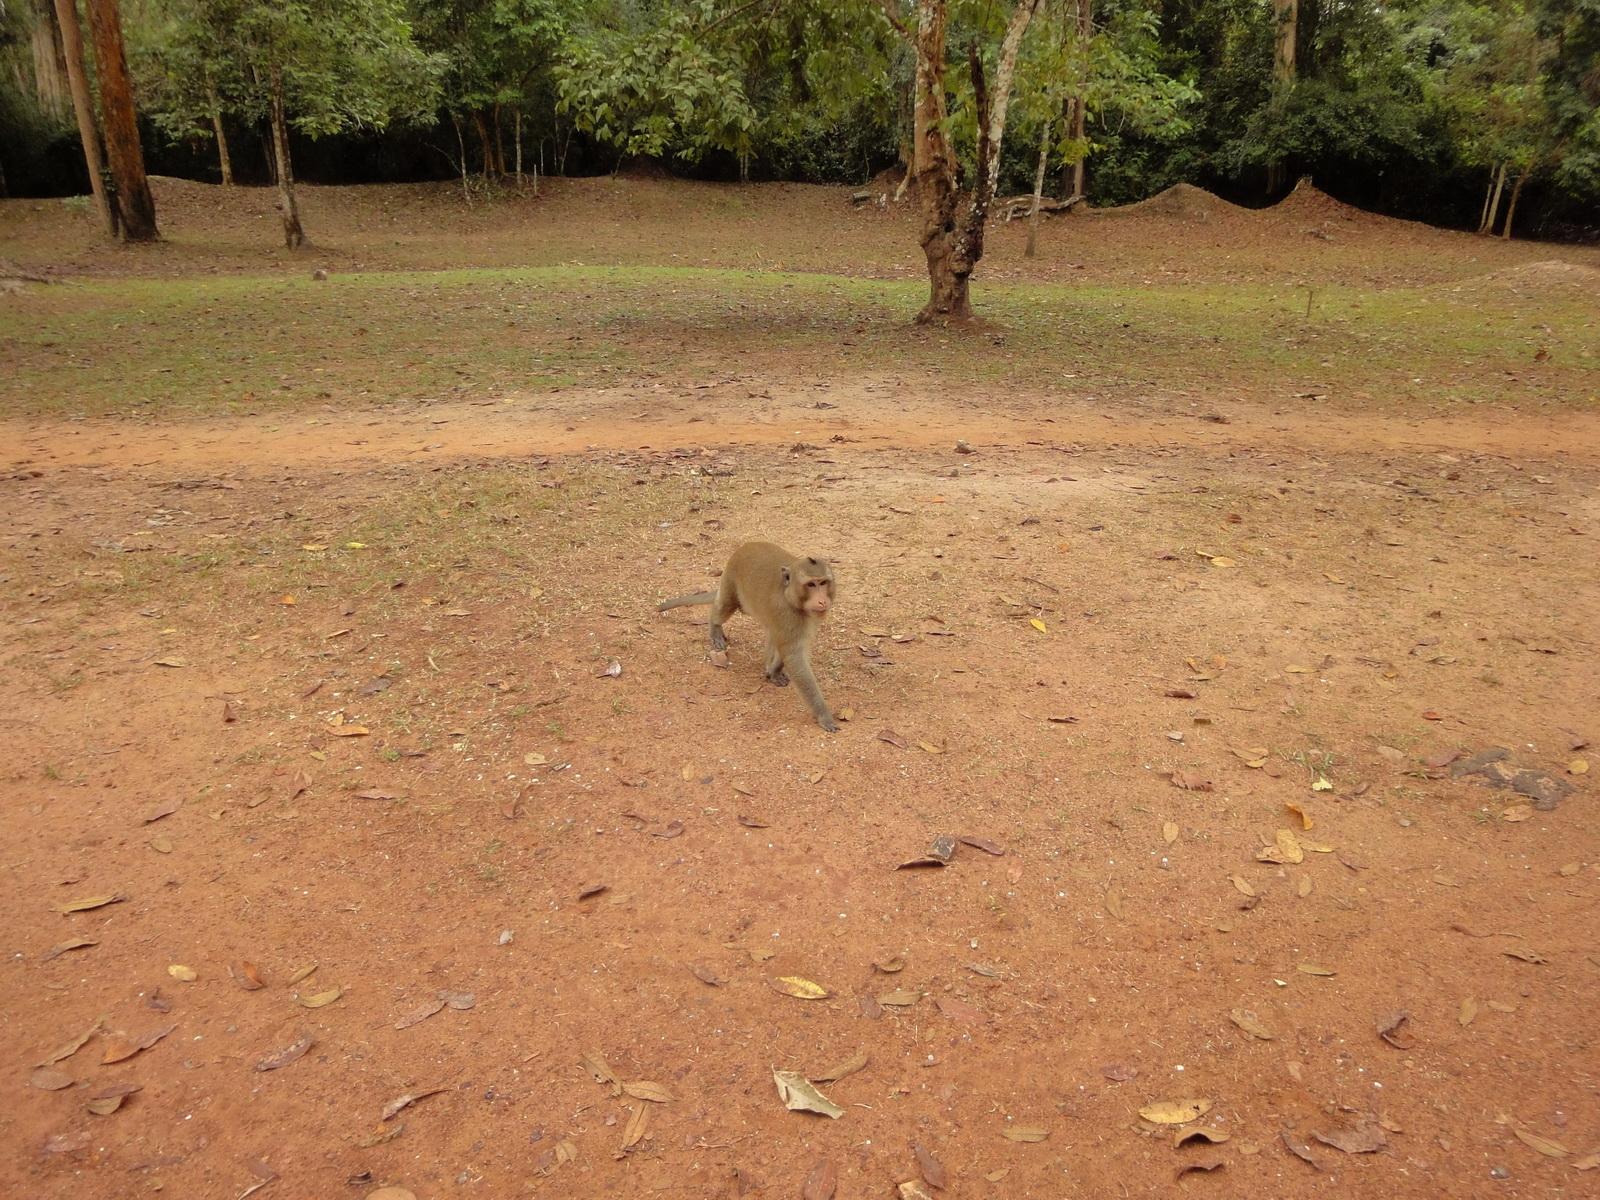 Terrace of the Elephants wild monkeys Cambodia 01